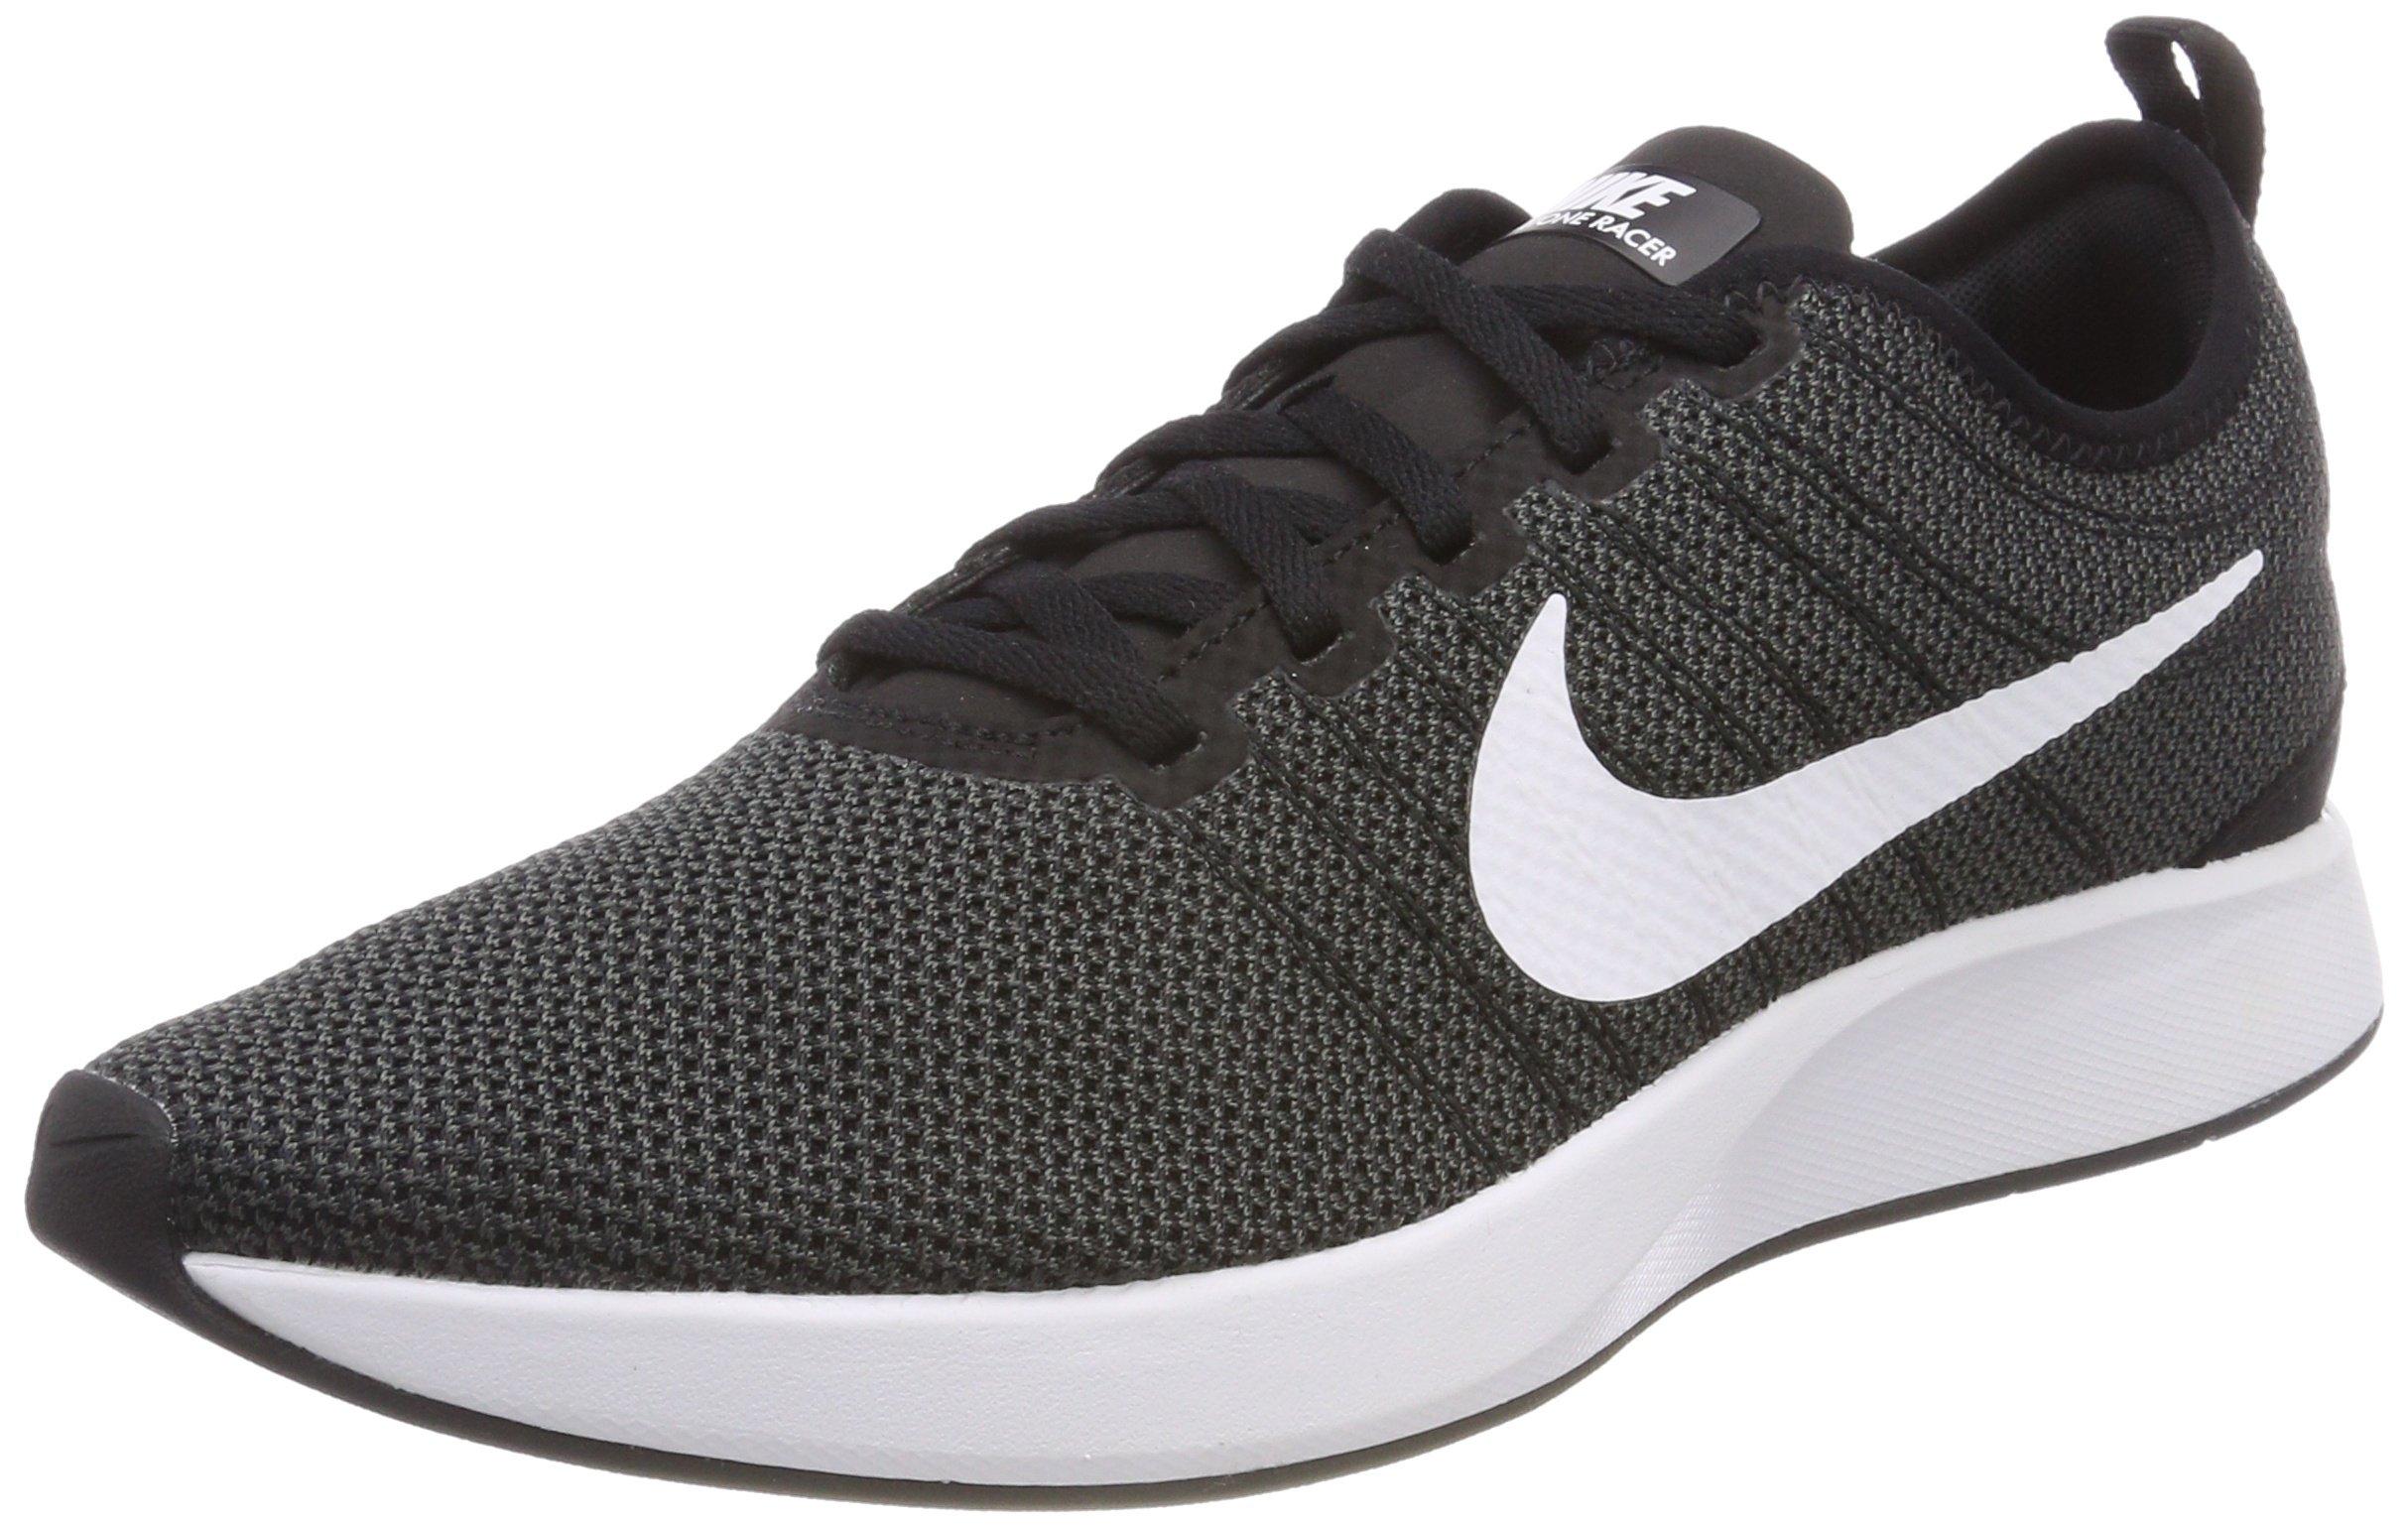 Noirblack 00247 Gymnastique Eu Racer white Homme NikeDualtone Grey De dark Chaussures 8w0XnPkO